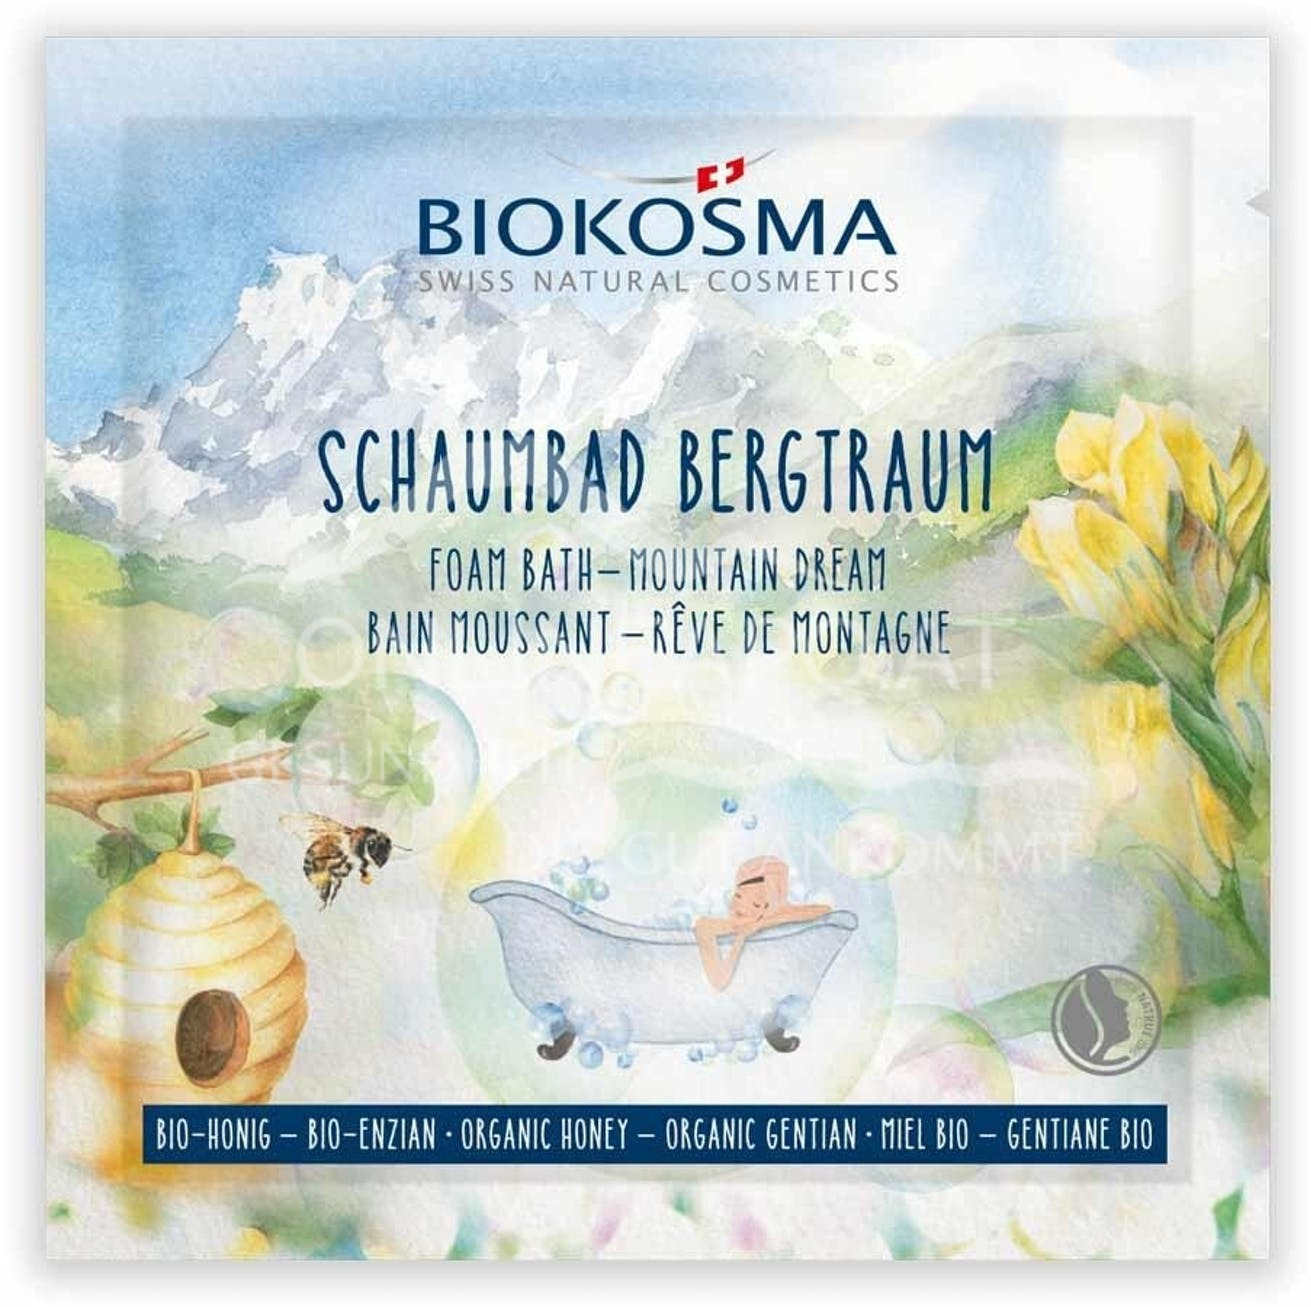 BIOKOSMA Schaumbad Bergtraum